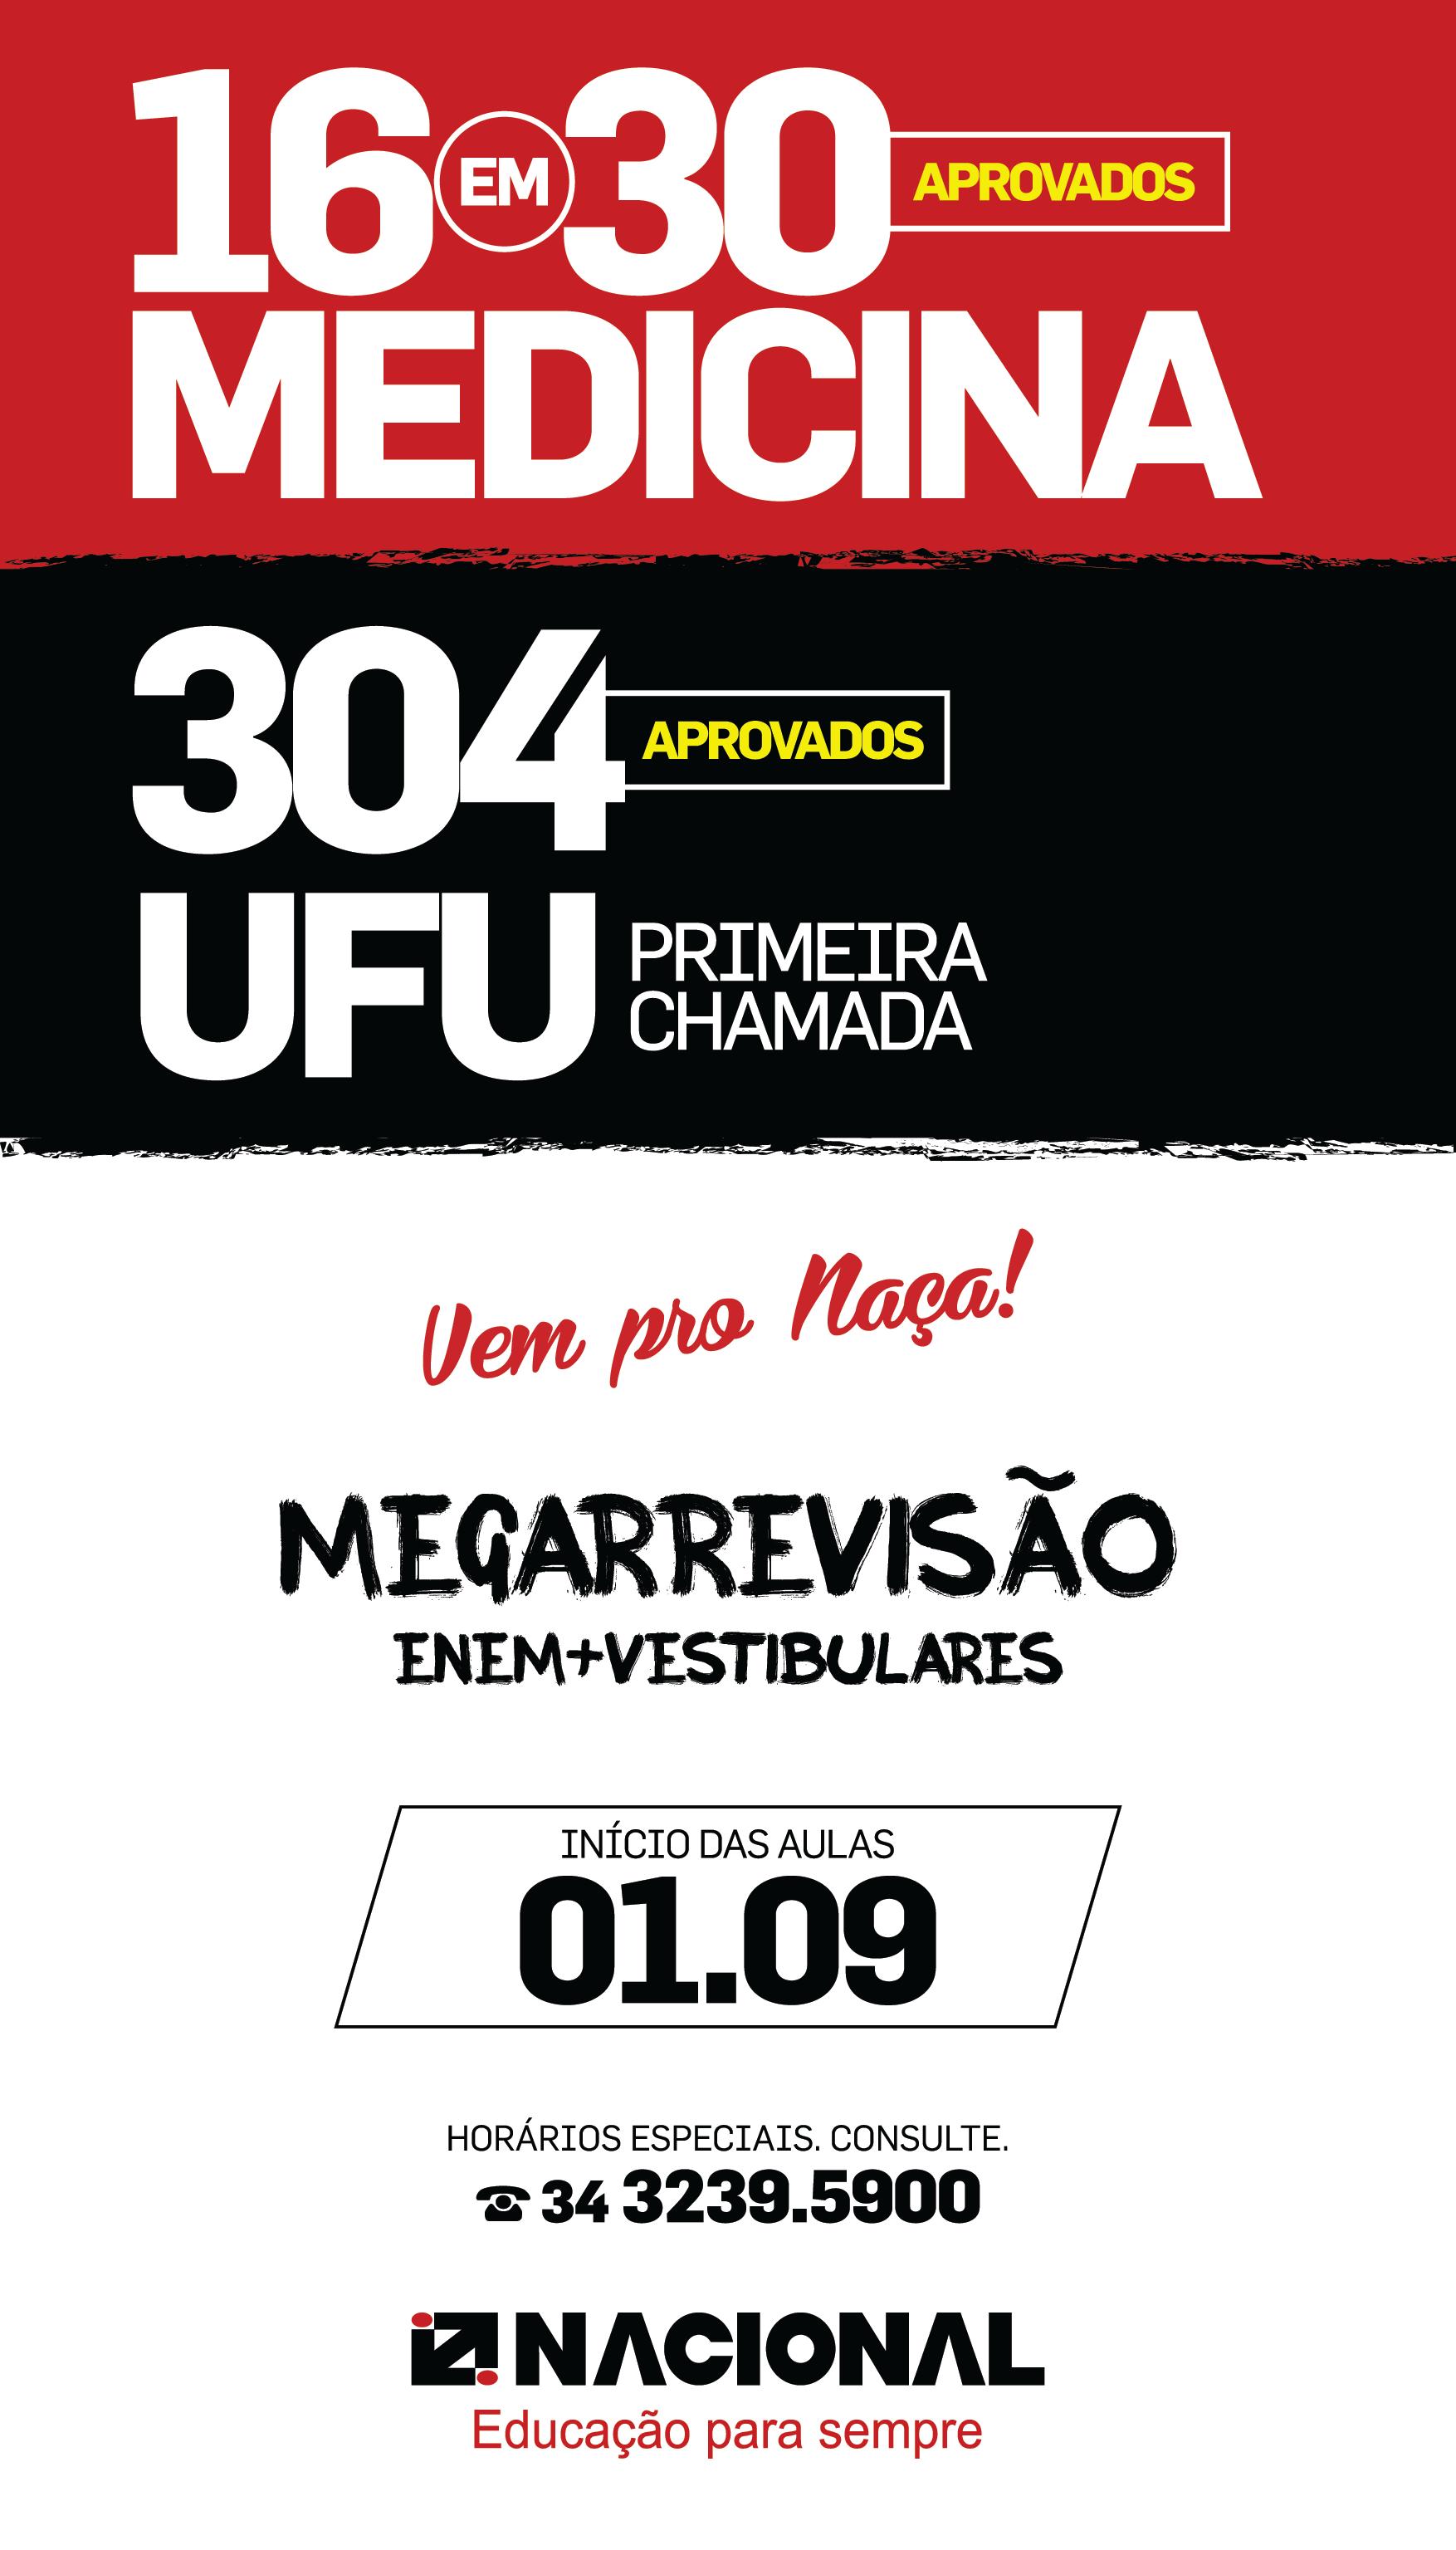 Email Marketing - Megarrevisao 14